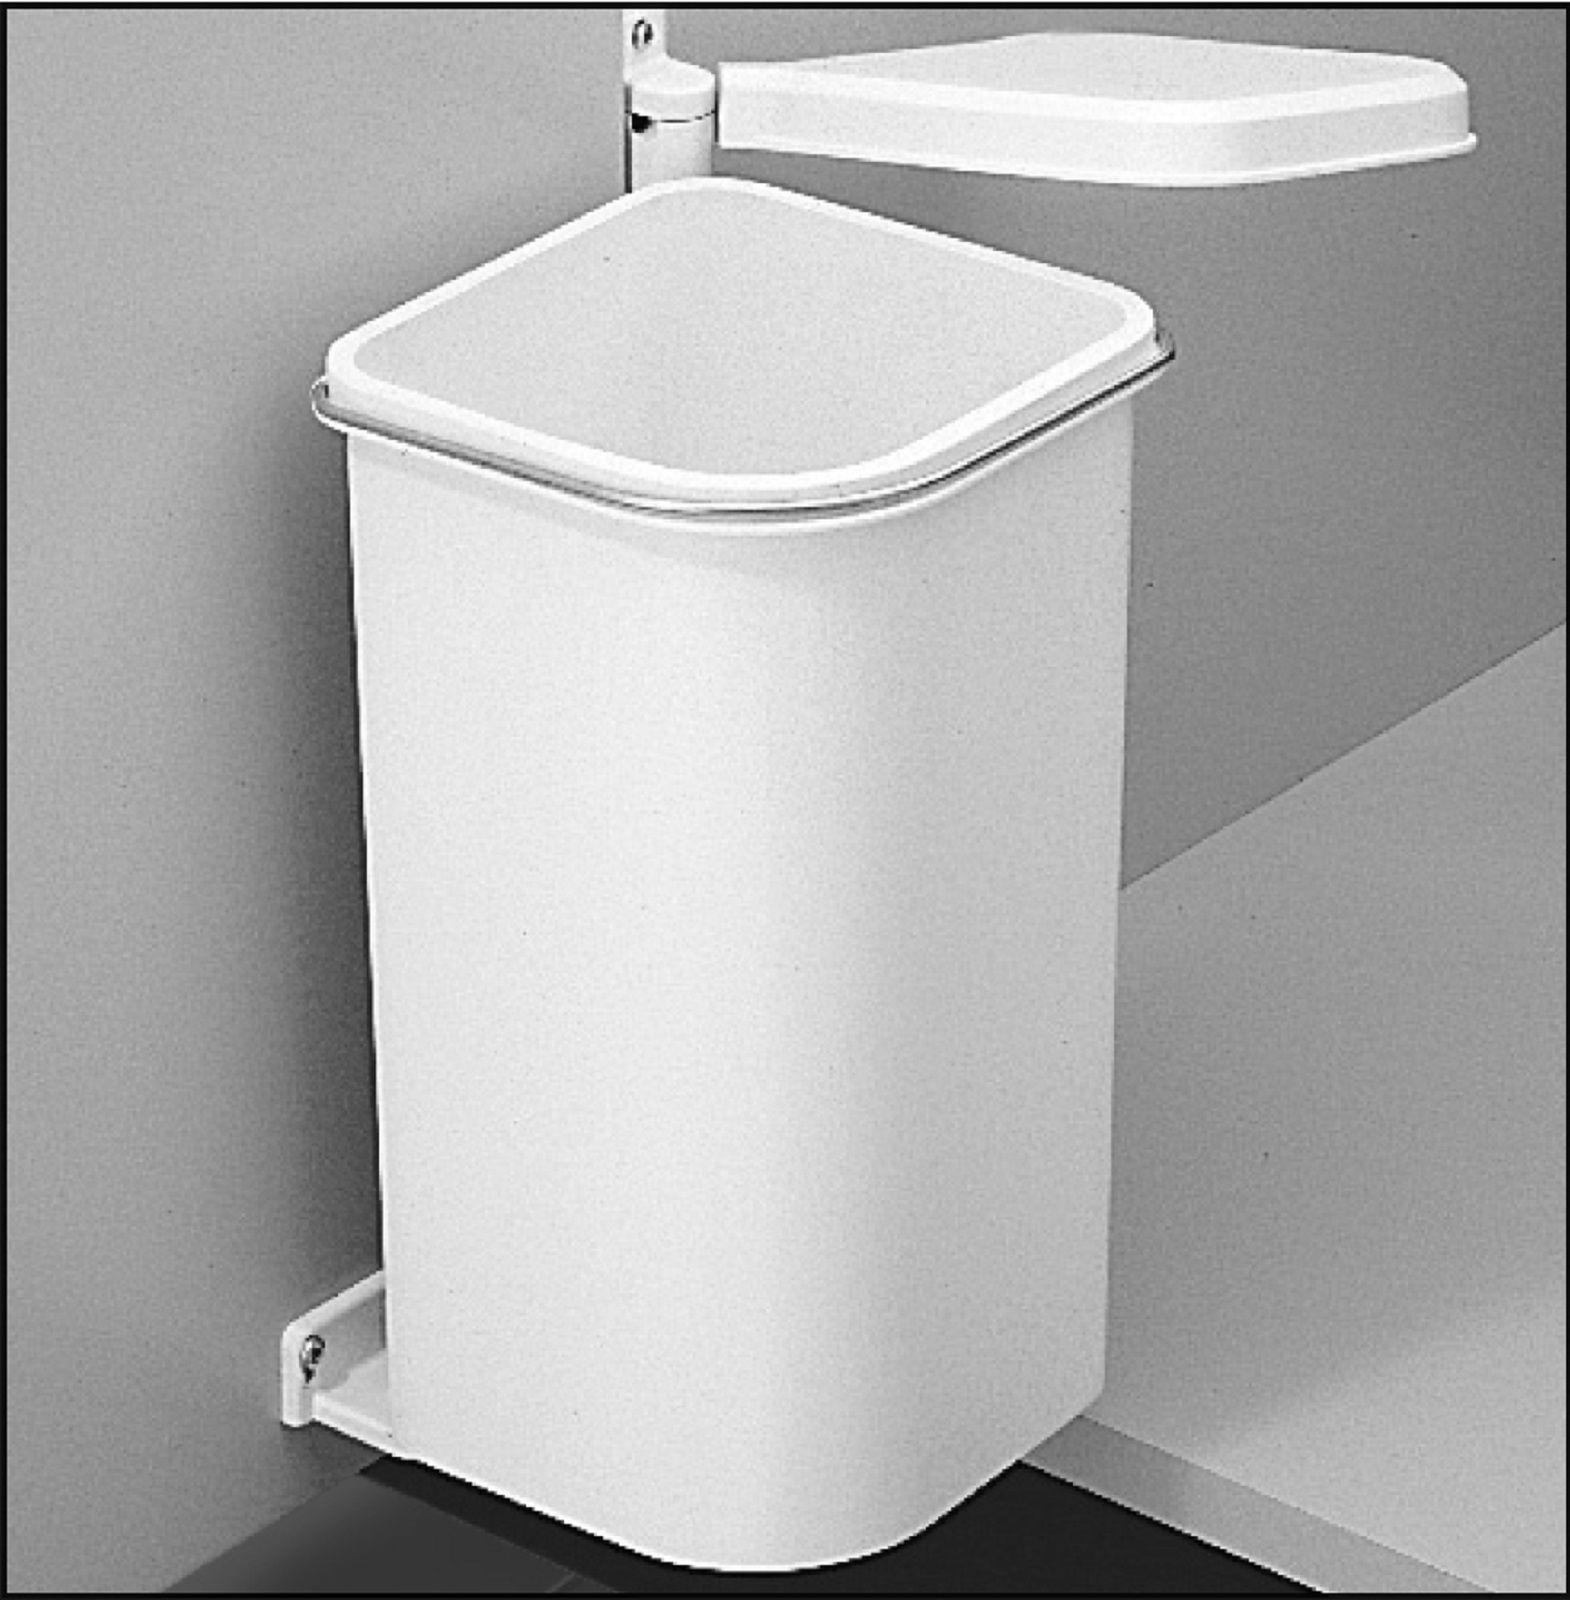 mulleimer badezimmer mulleimer badezimmer ideen schones design mlleimer jtleigh schacbnes. Black Bedroom Furniture Sets. Home Design Ideas